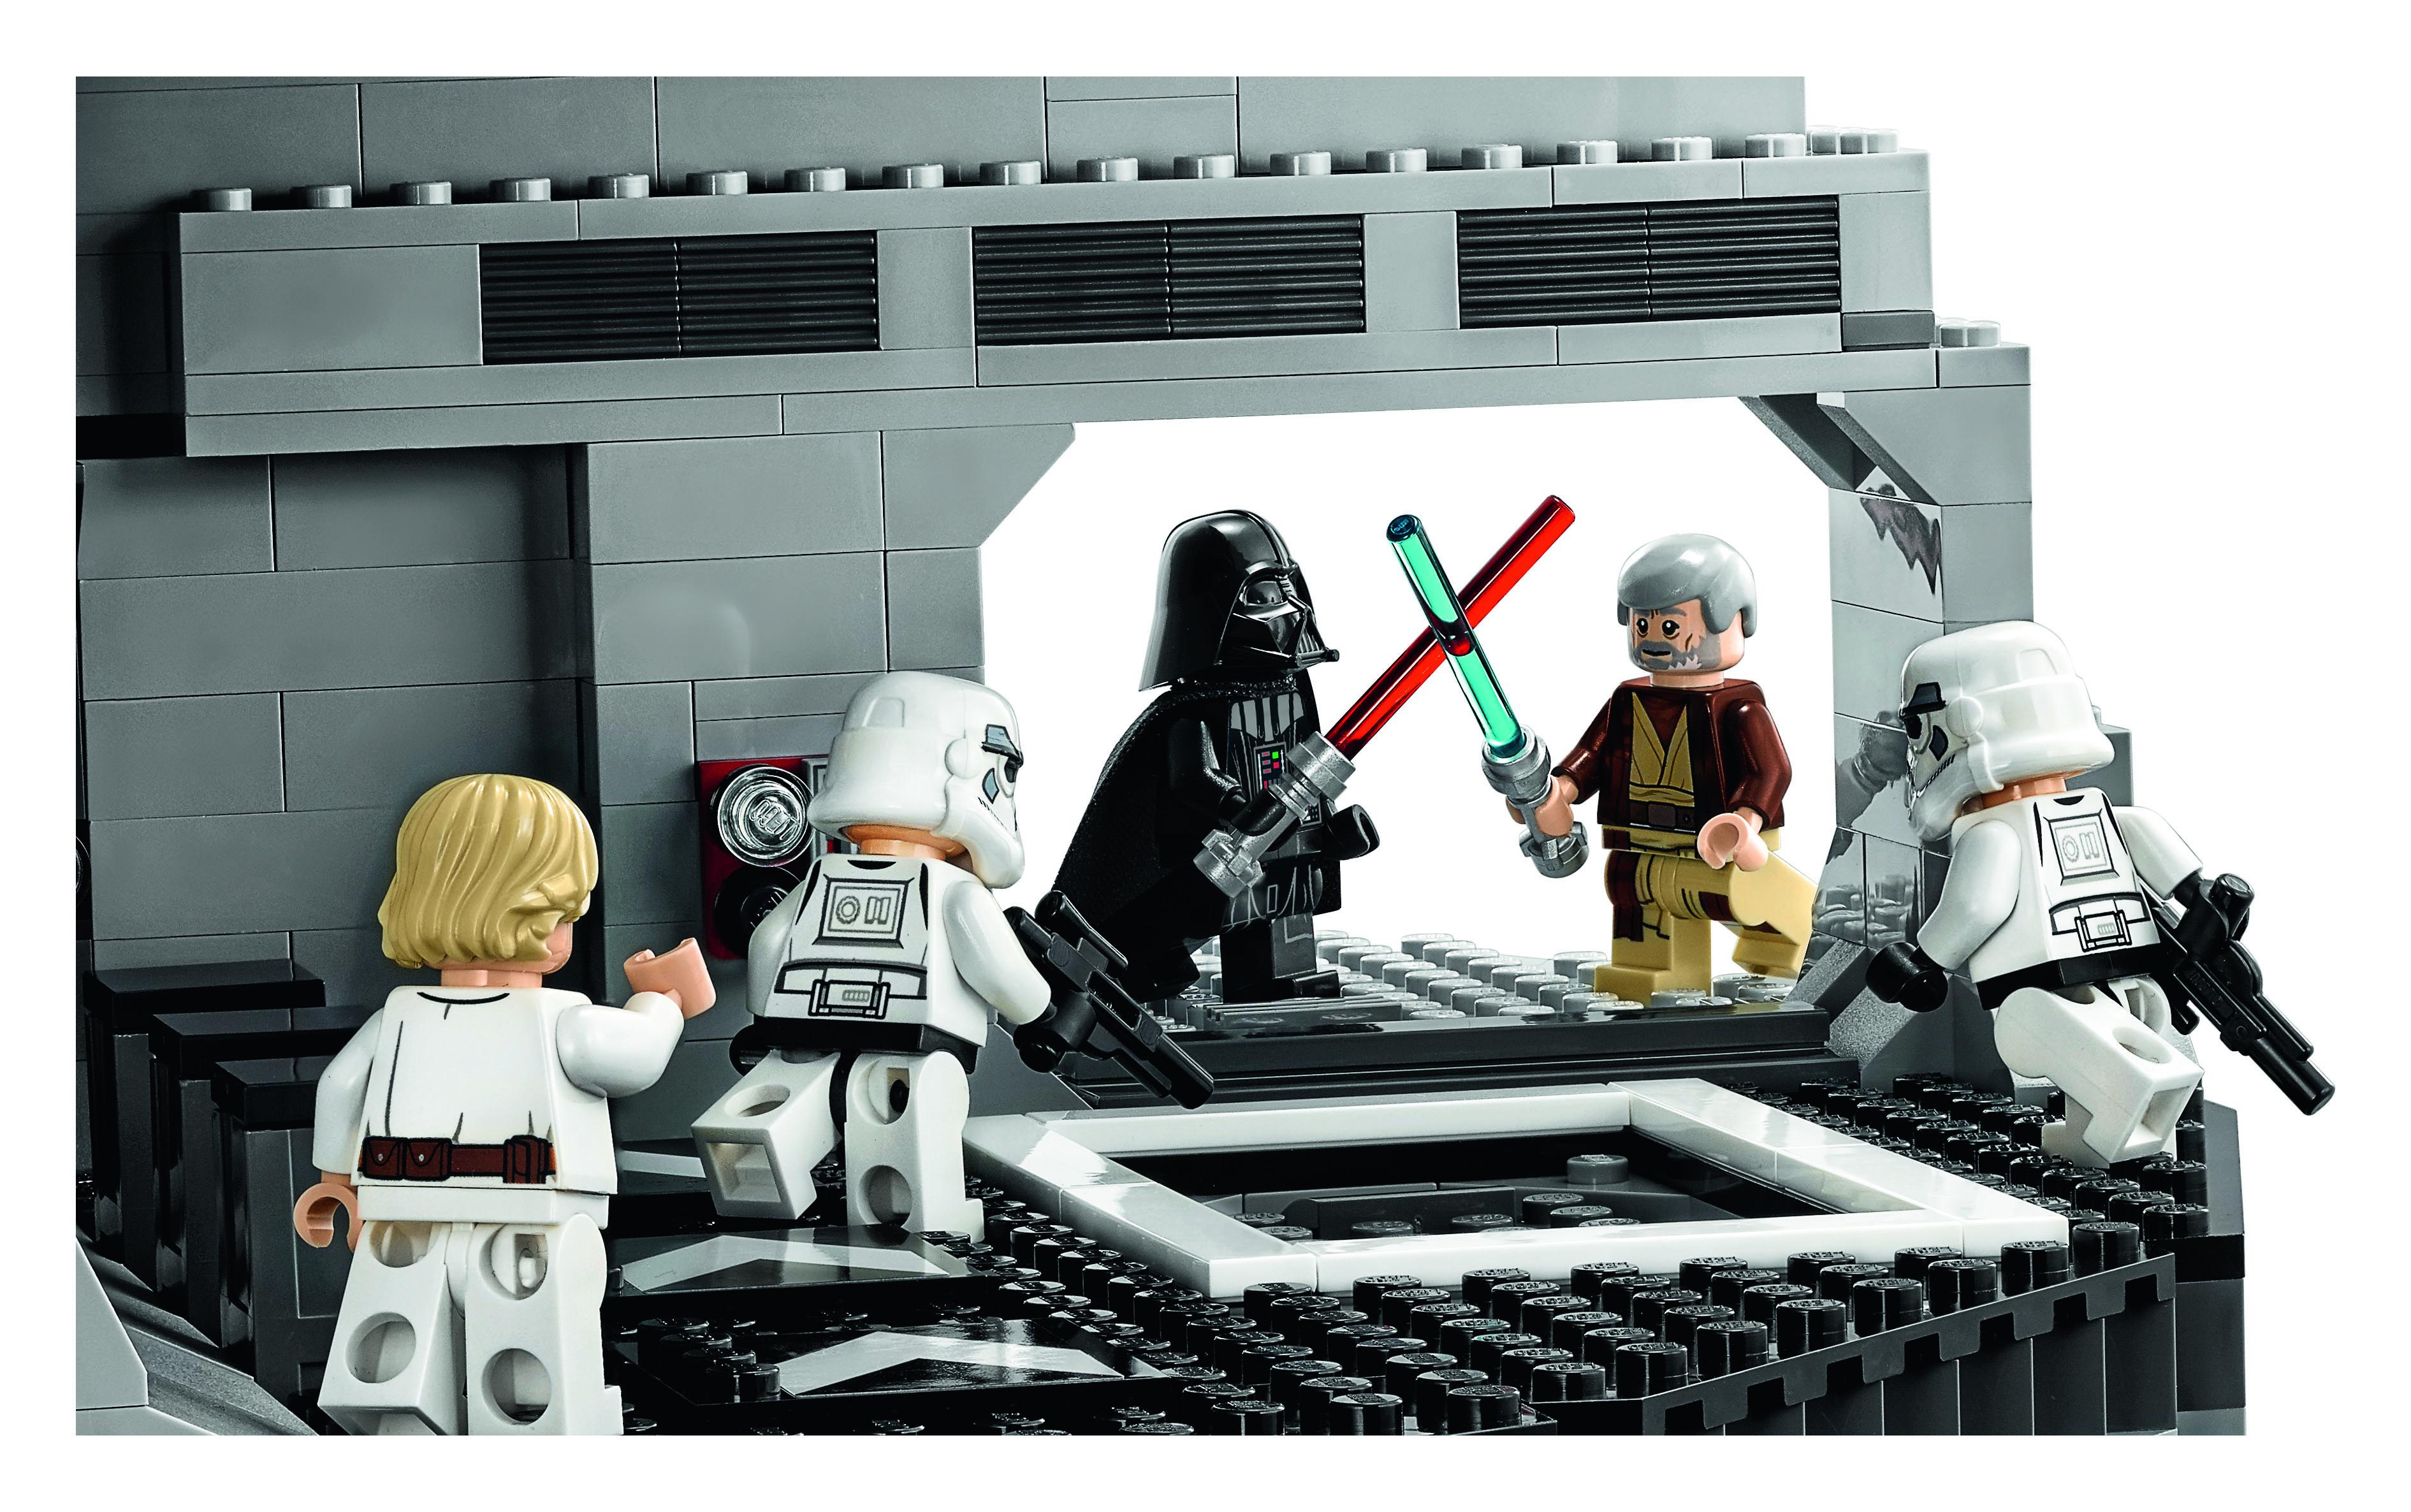 Lego Star Wars Ucs Death Star 75159 13 The Brick Fan